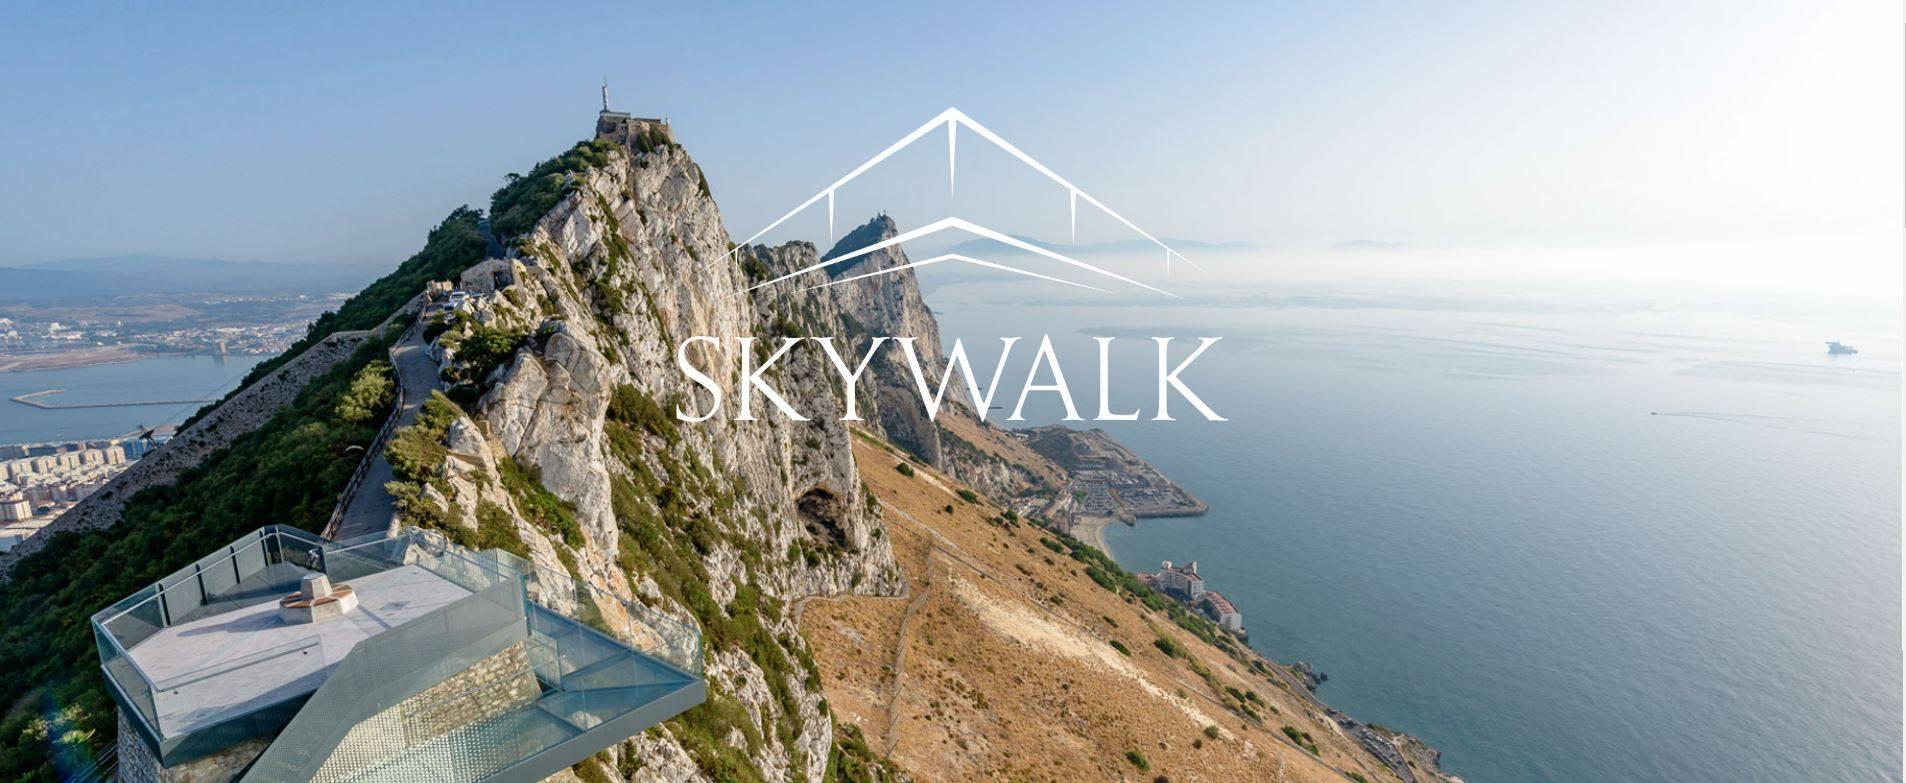 Sky Walk Boards : Visit gibraltar the official tourist board website